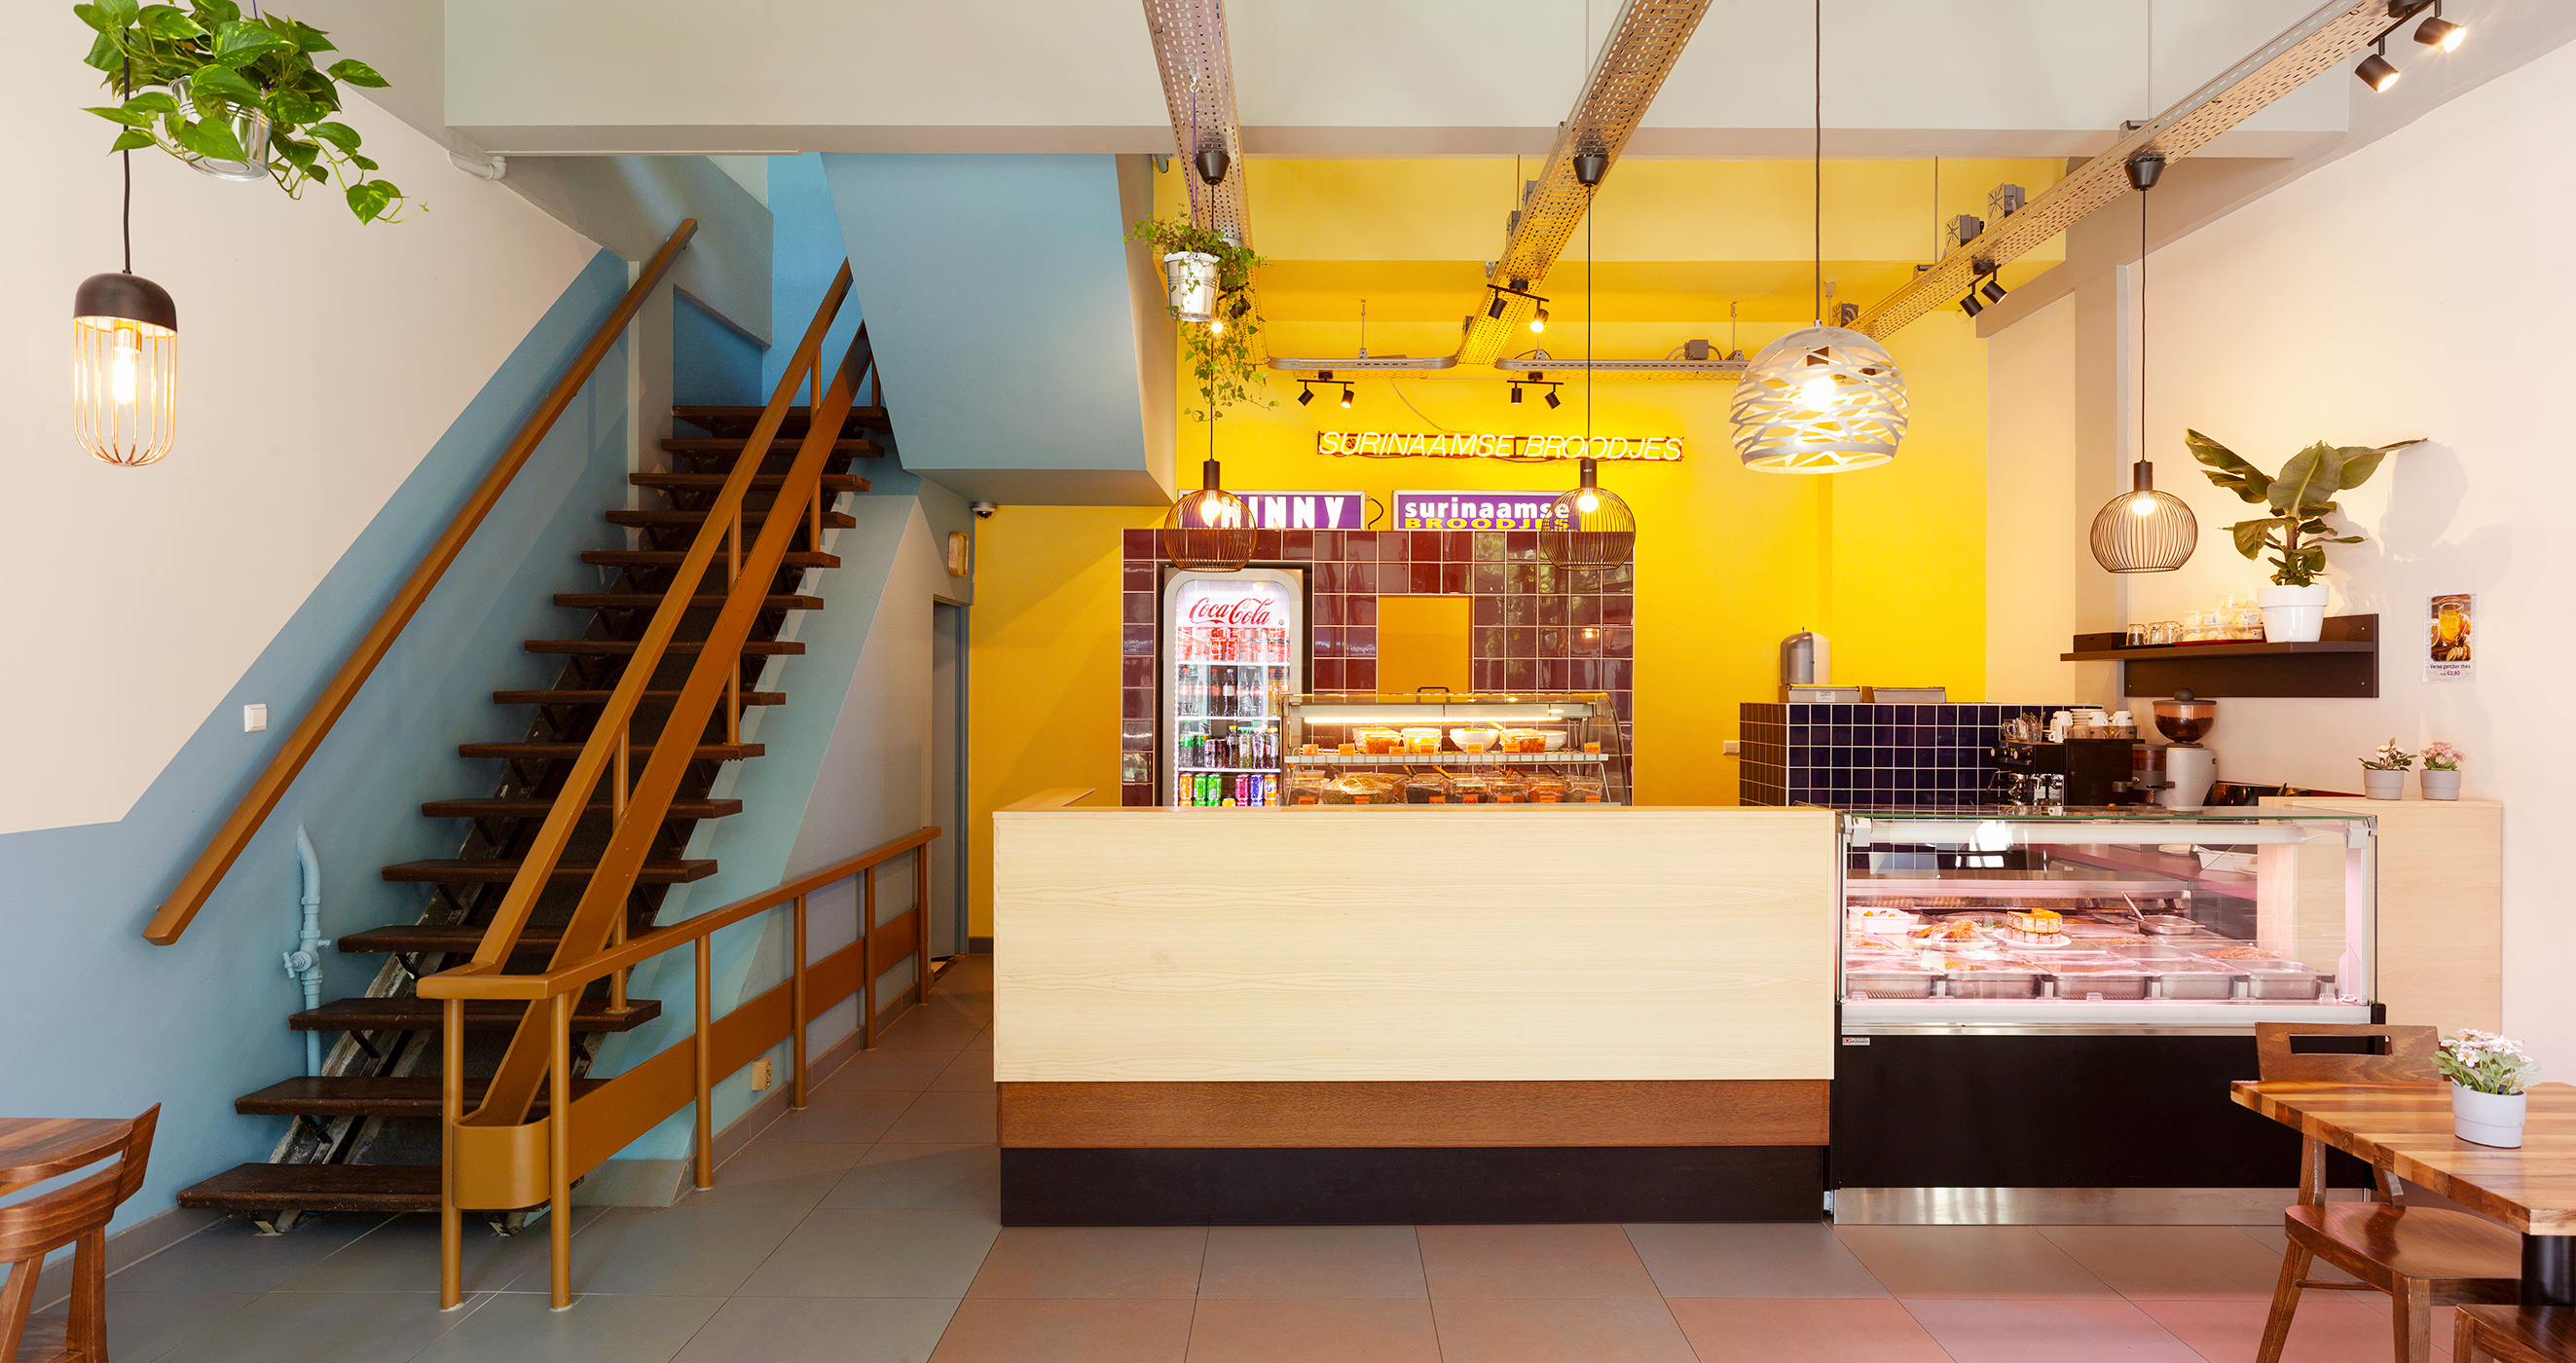 Lagado-architect-chinny-surinaamse-broodjes-interieur-kleur-lijnbaan-rotterdam-Ruben-dario-kleimeer3